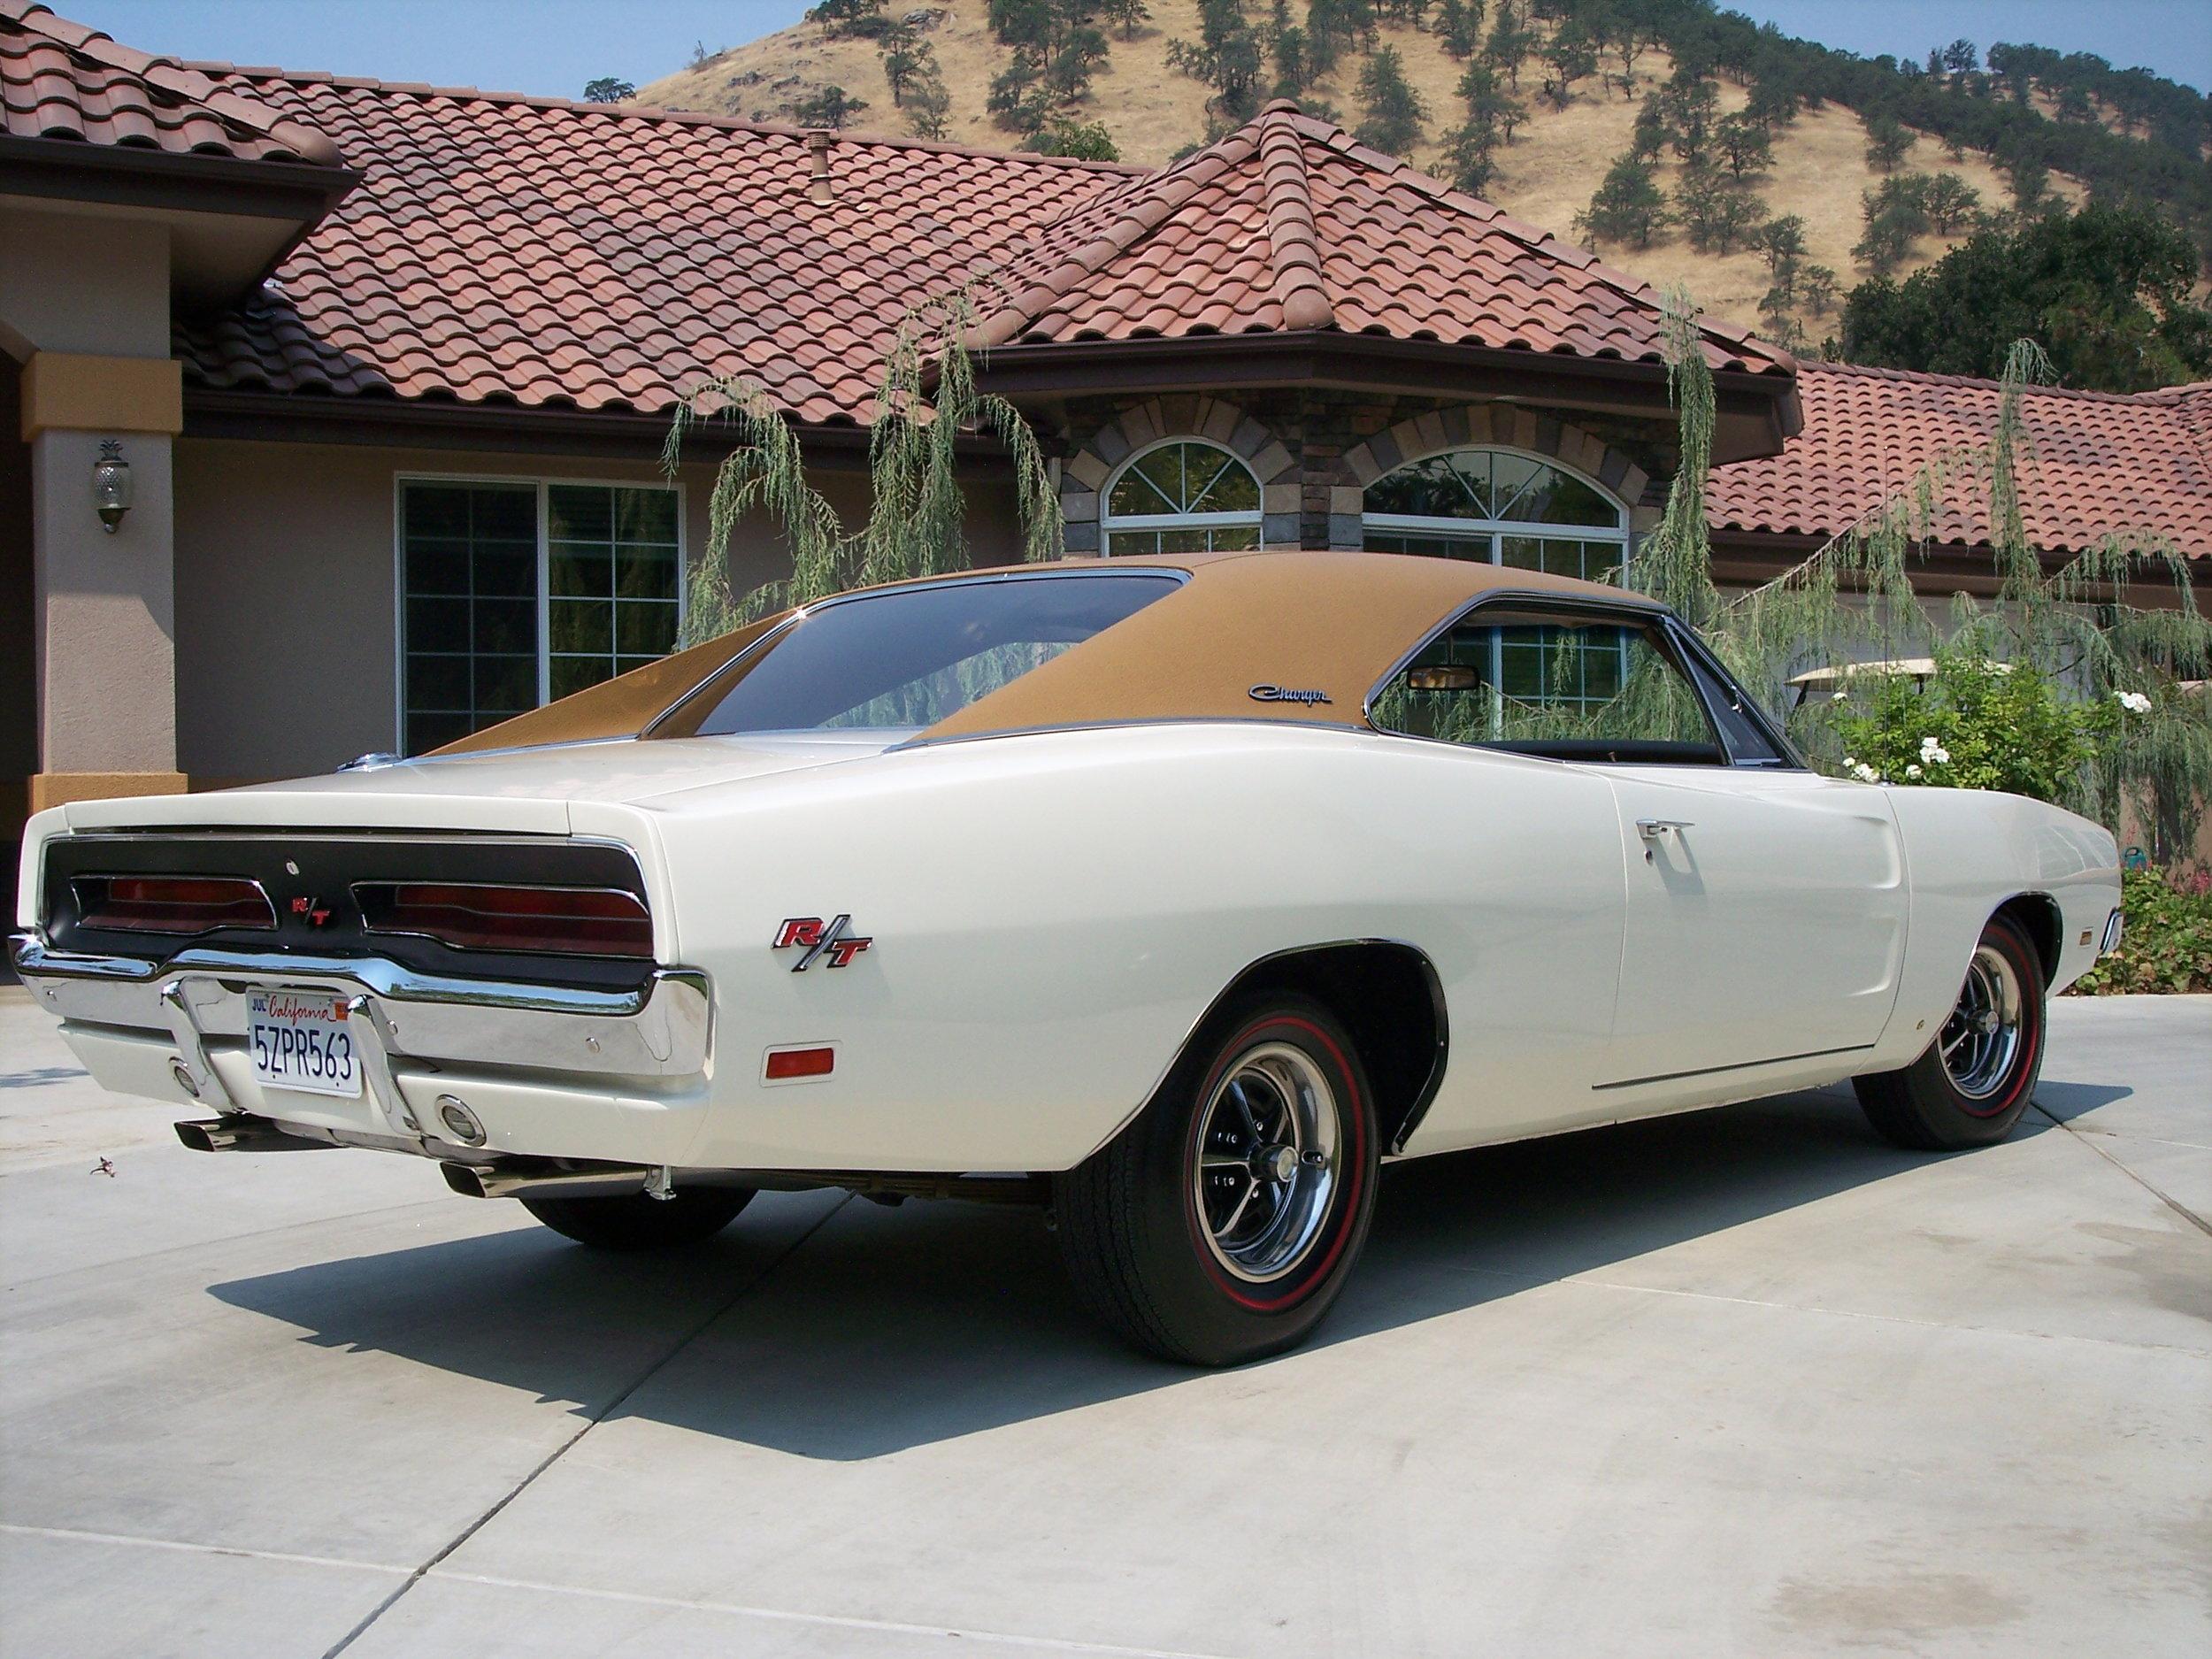 Charger-1969-white-tan .jpg